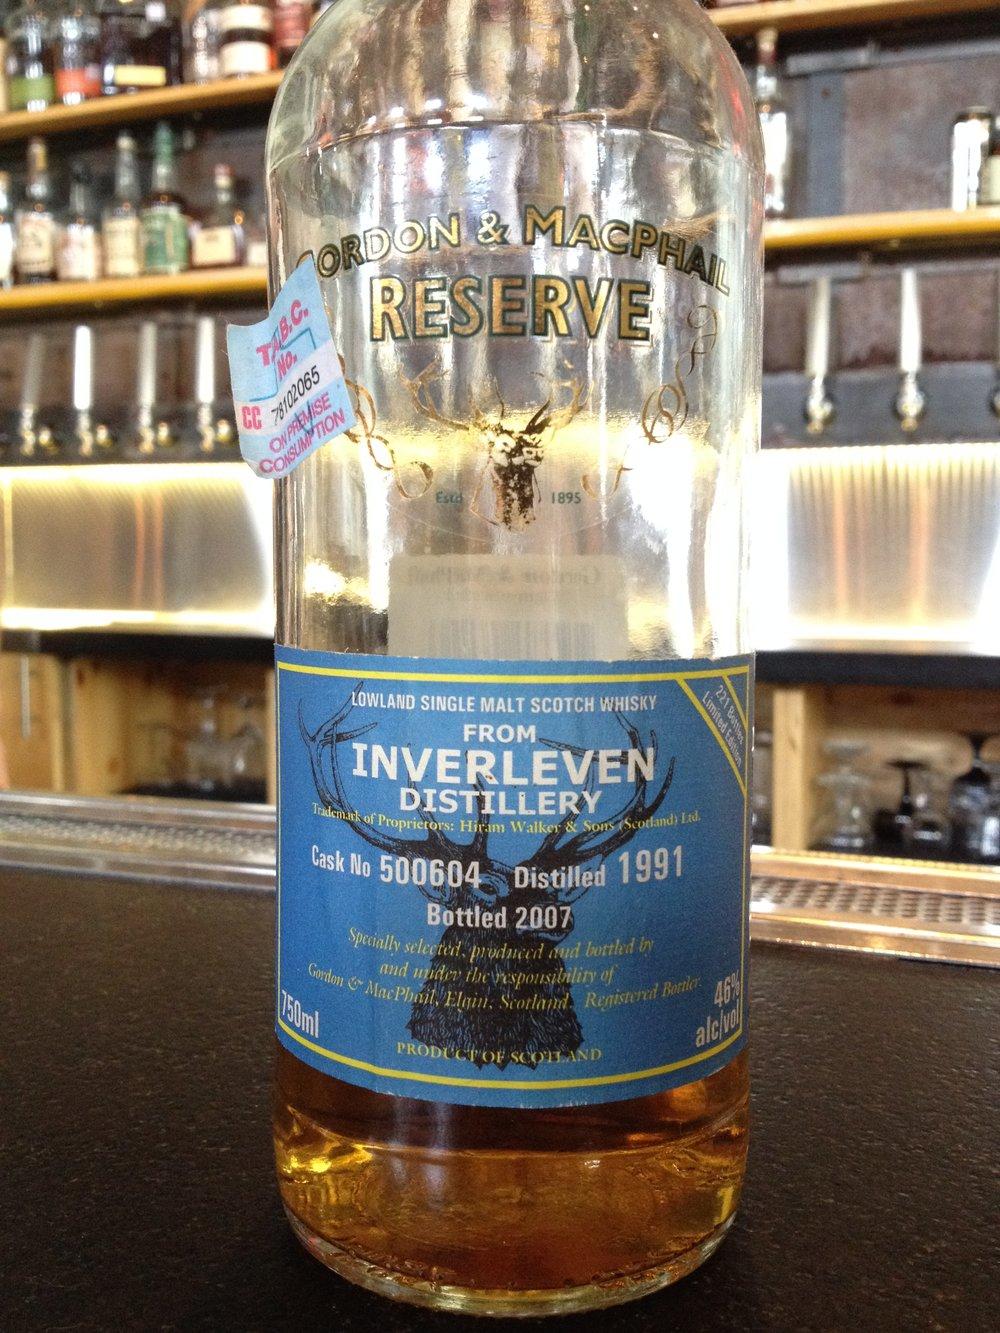 16 Year Old | 46% ABV - Distillery | Inverleven